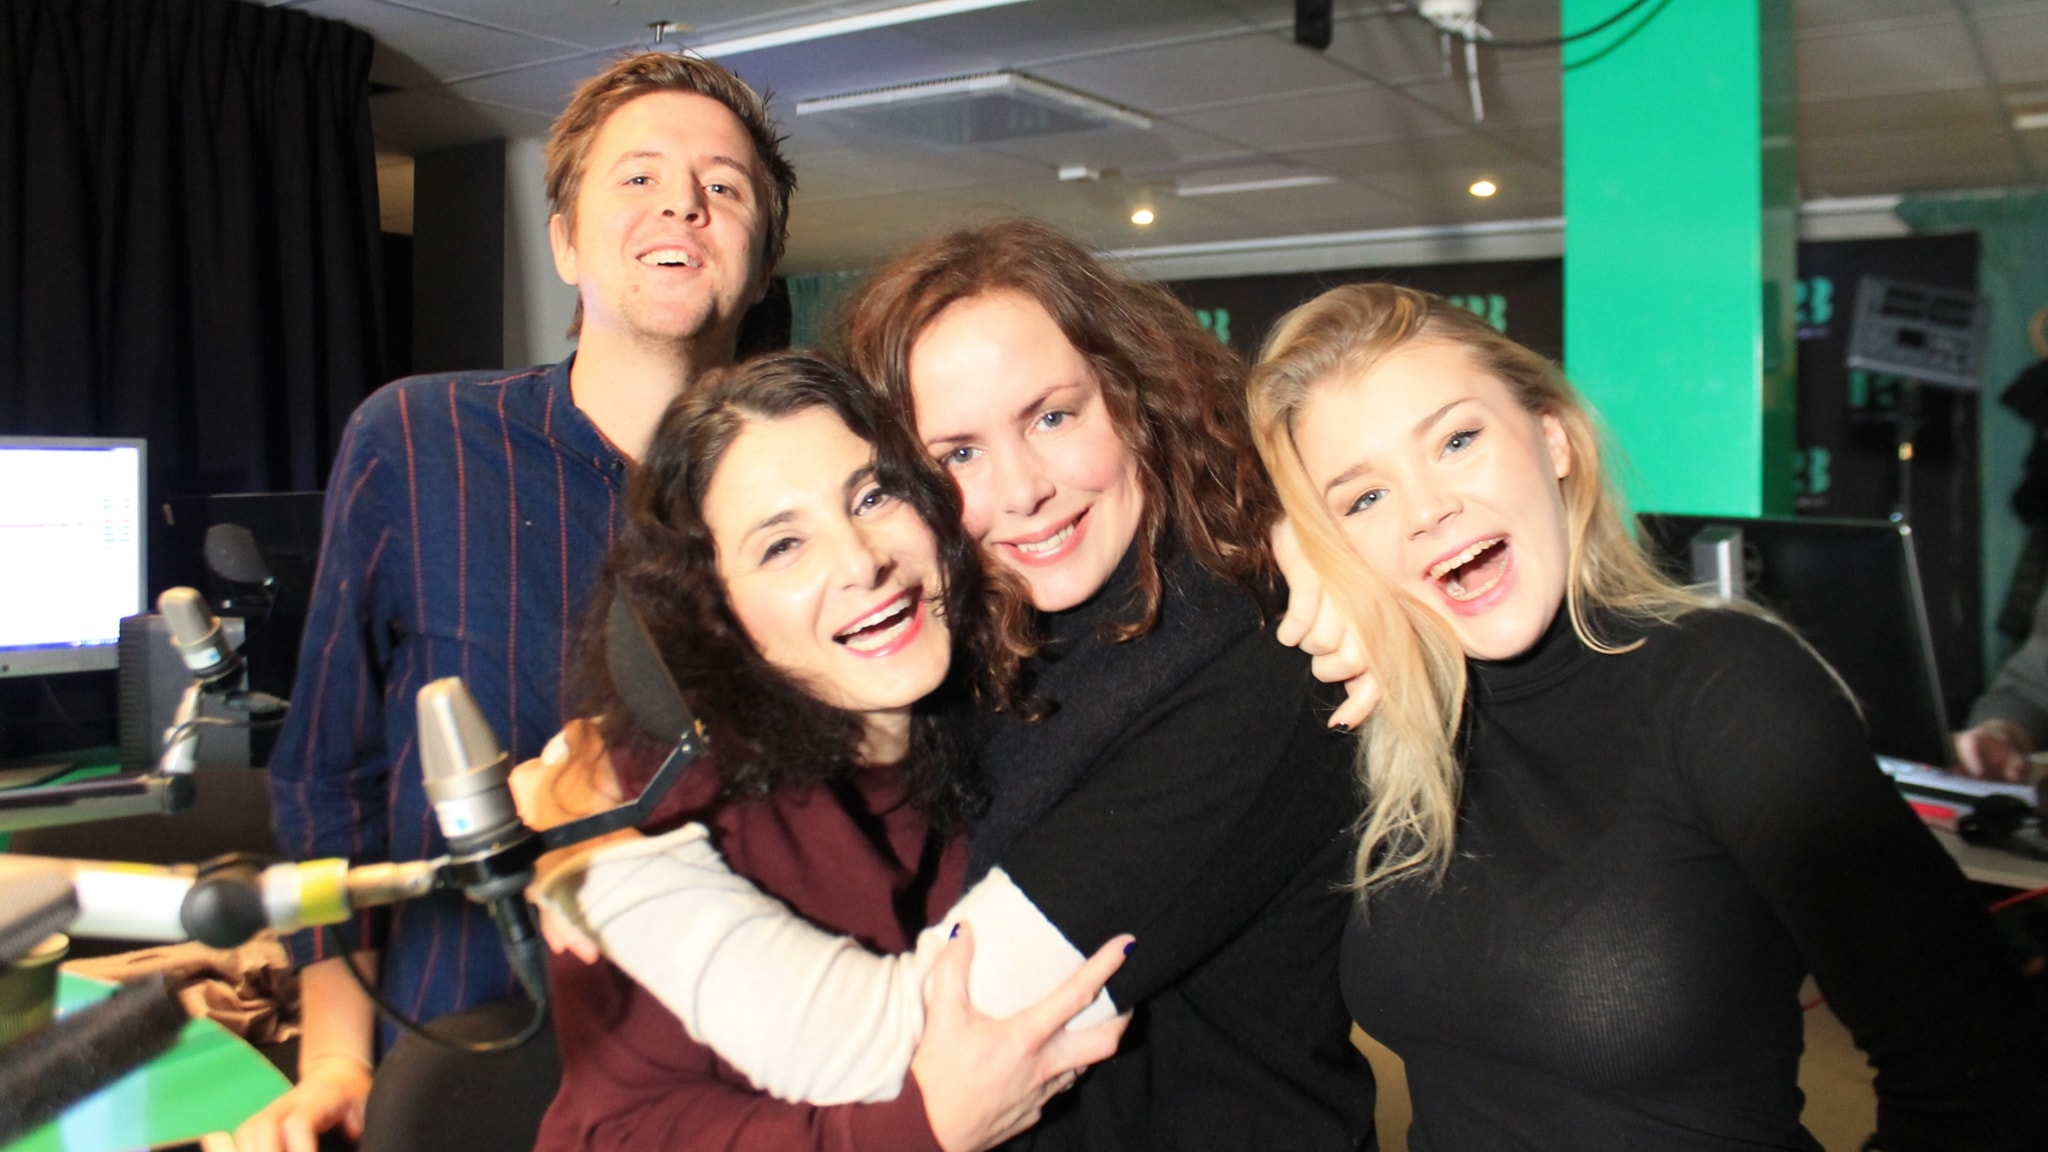 Kalle, Paulina Sokolow, Hanna och Kristina.